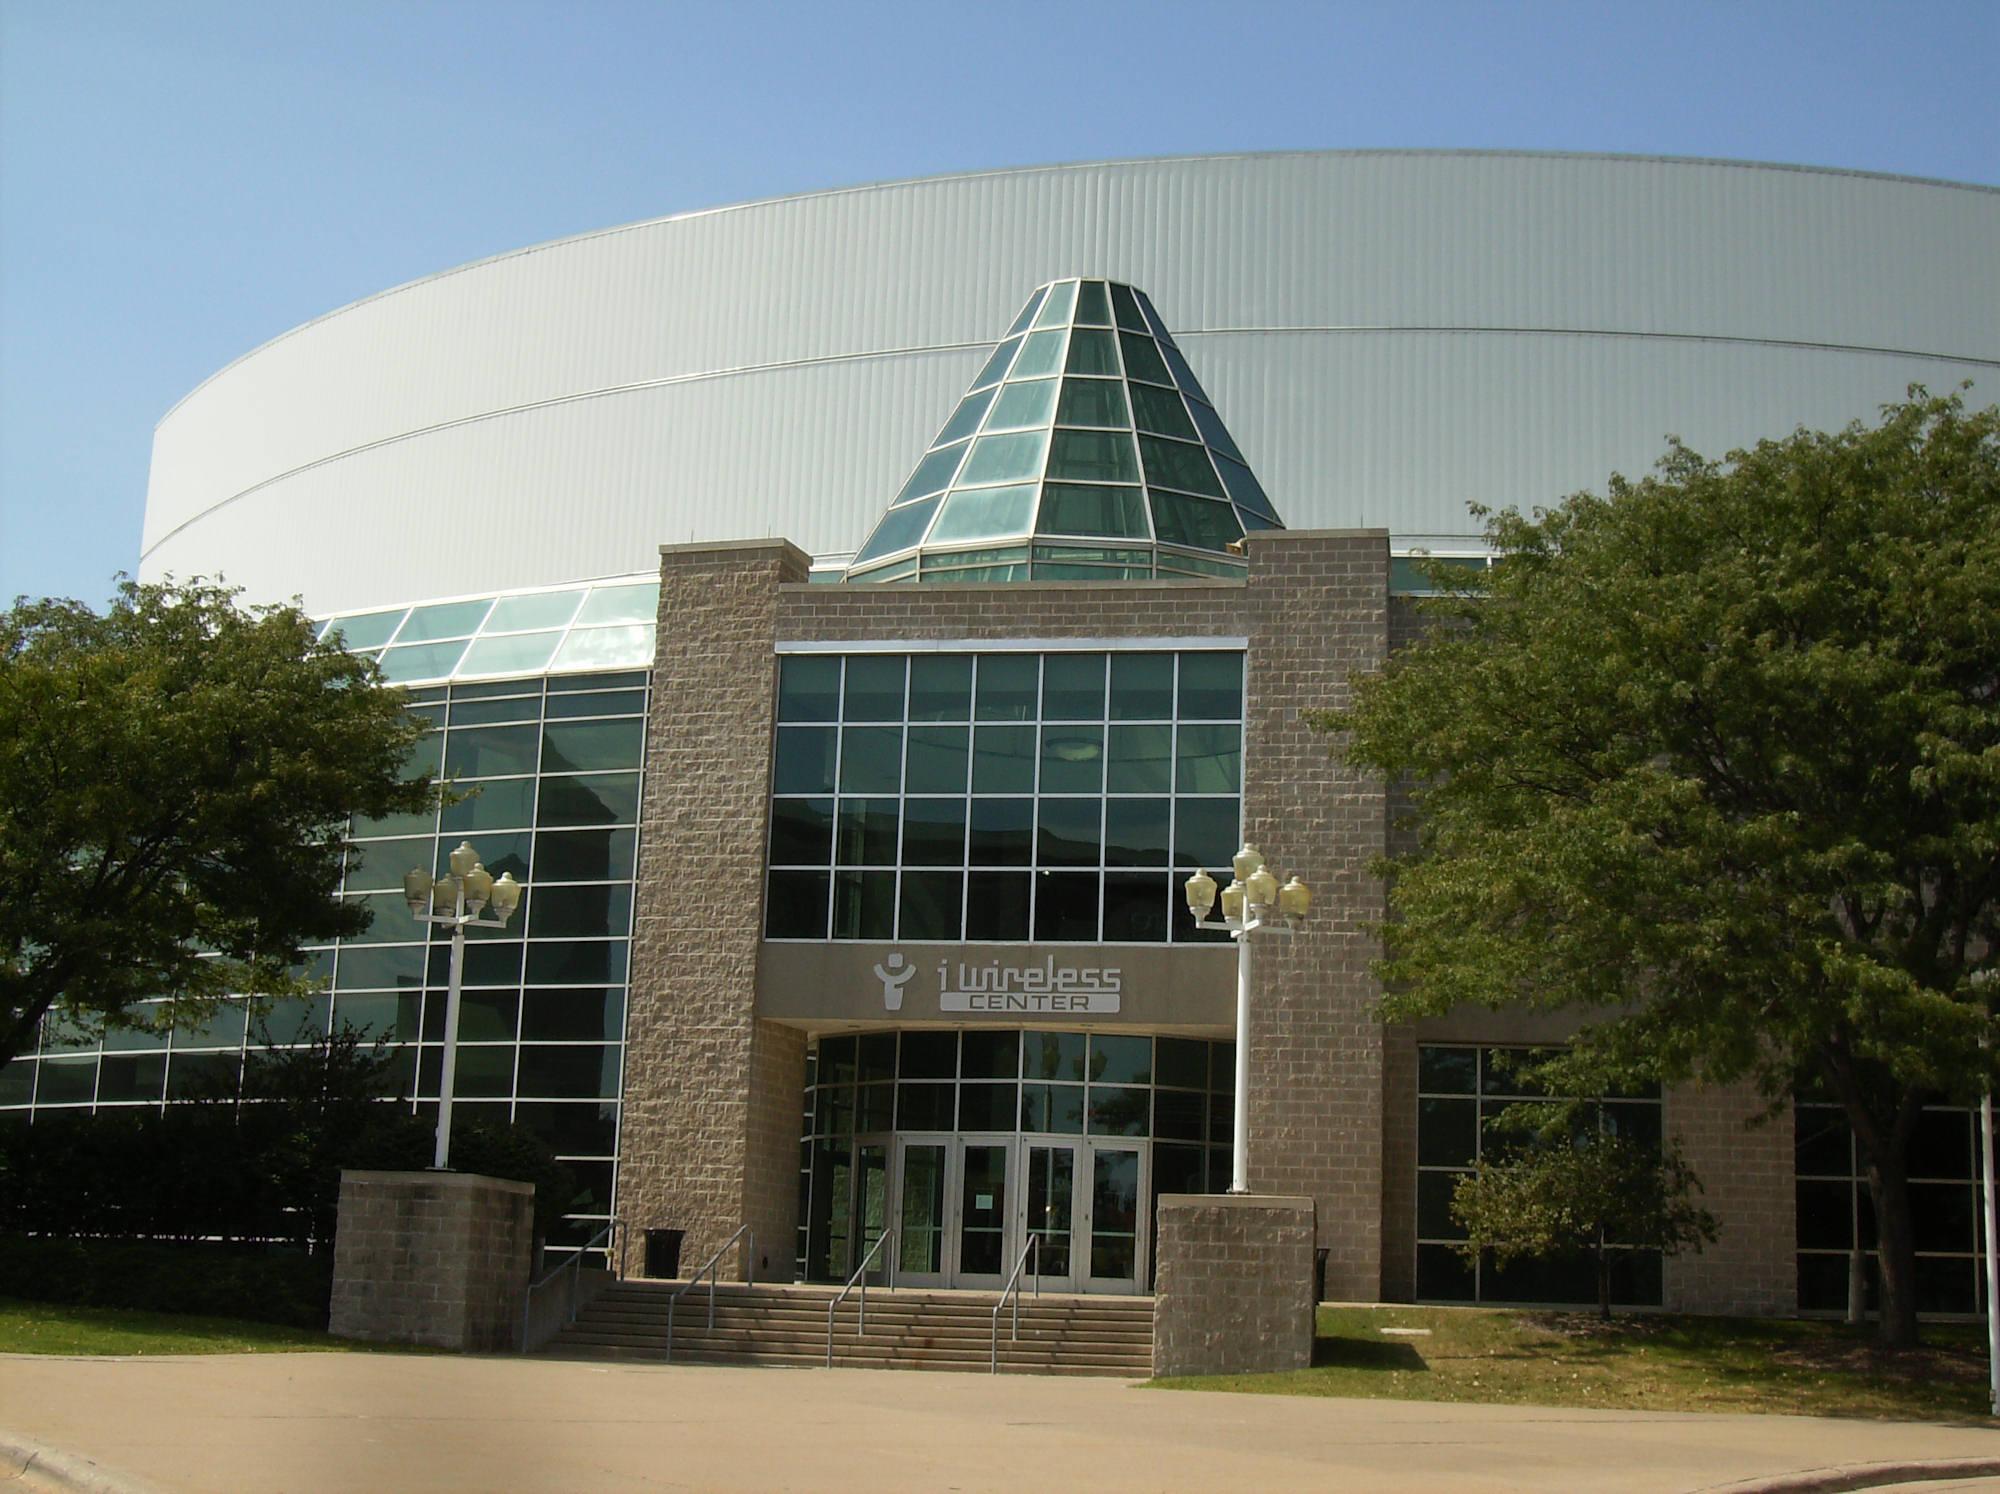 iWireless Center in Moline Hosts John Deere Event